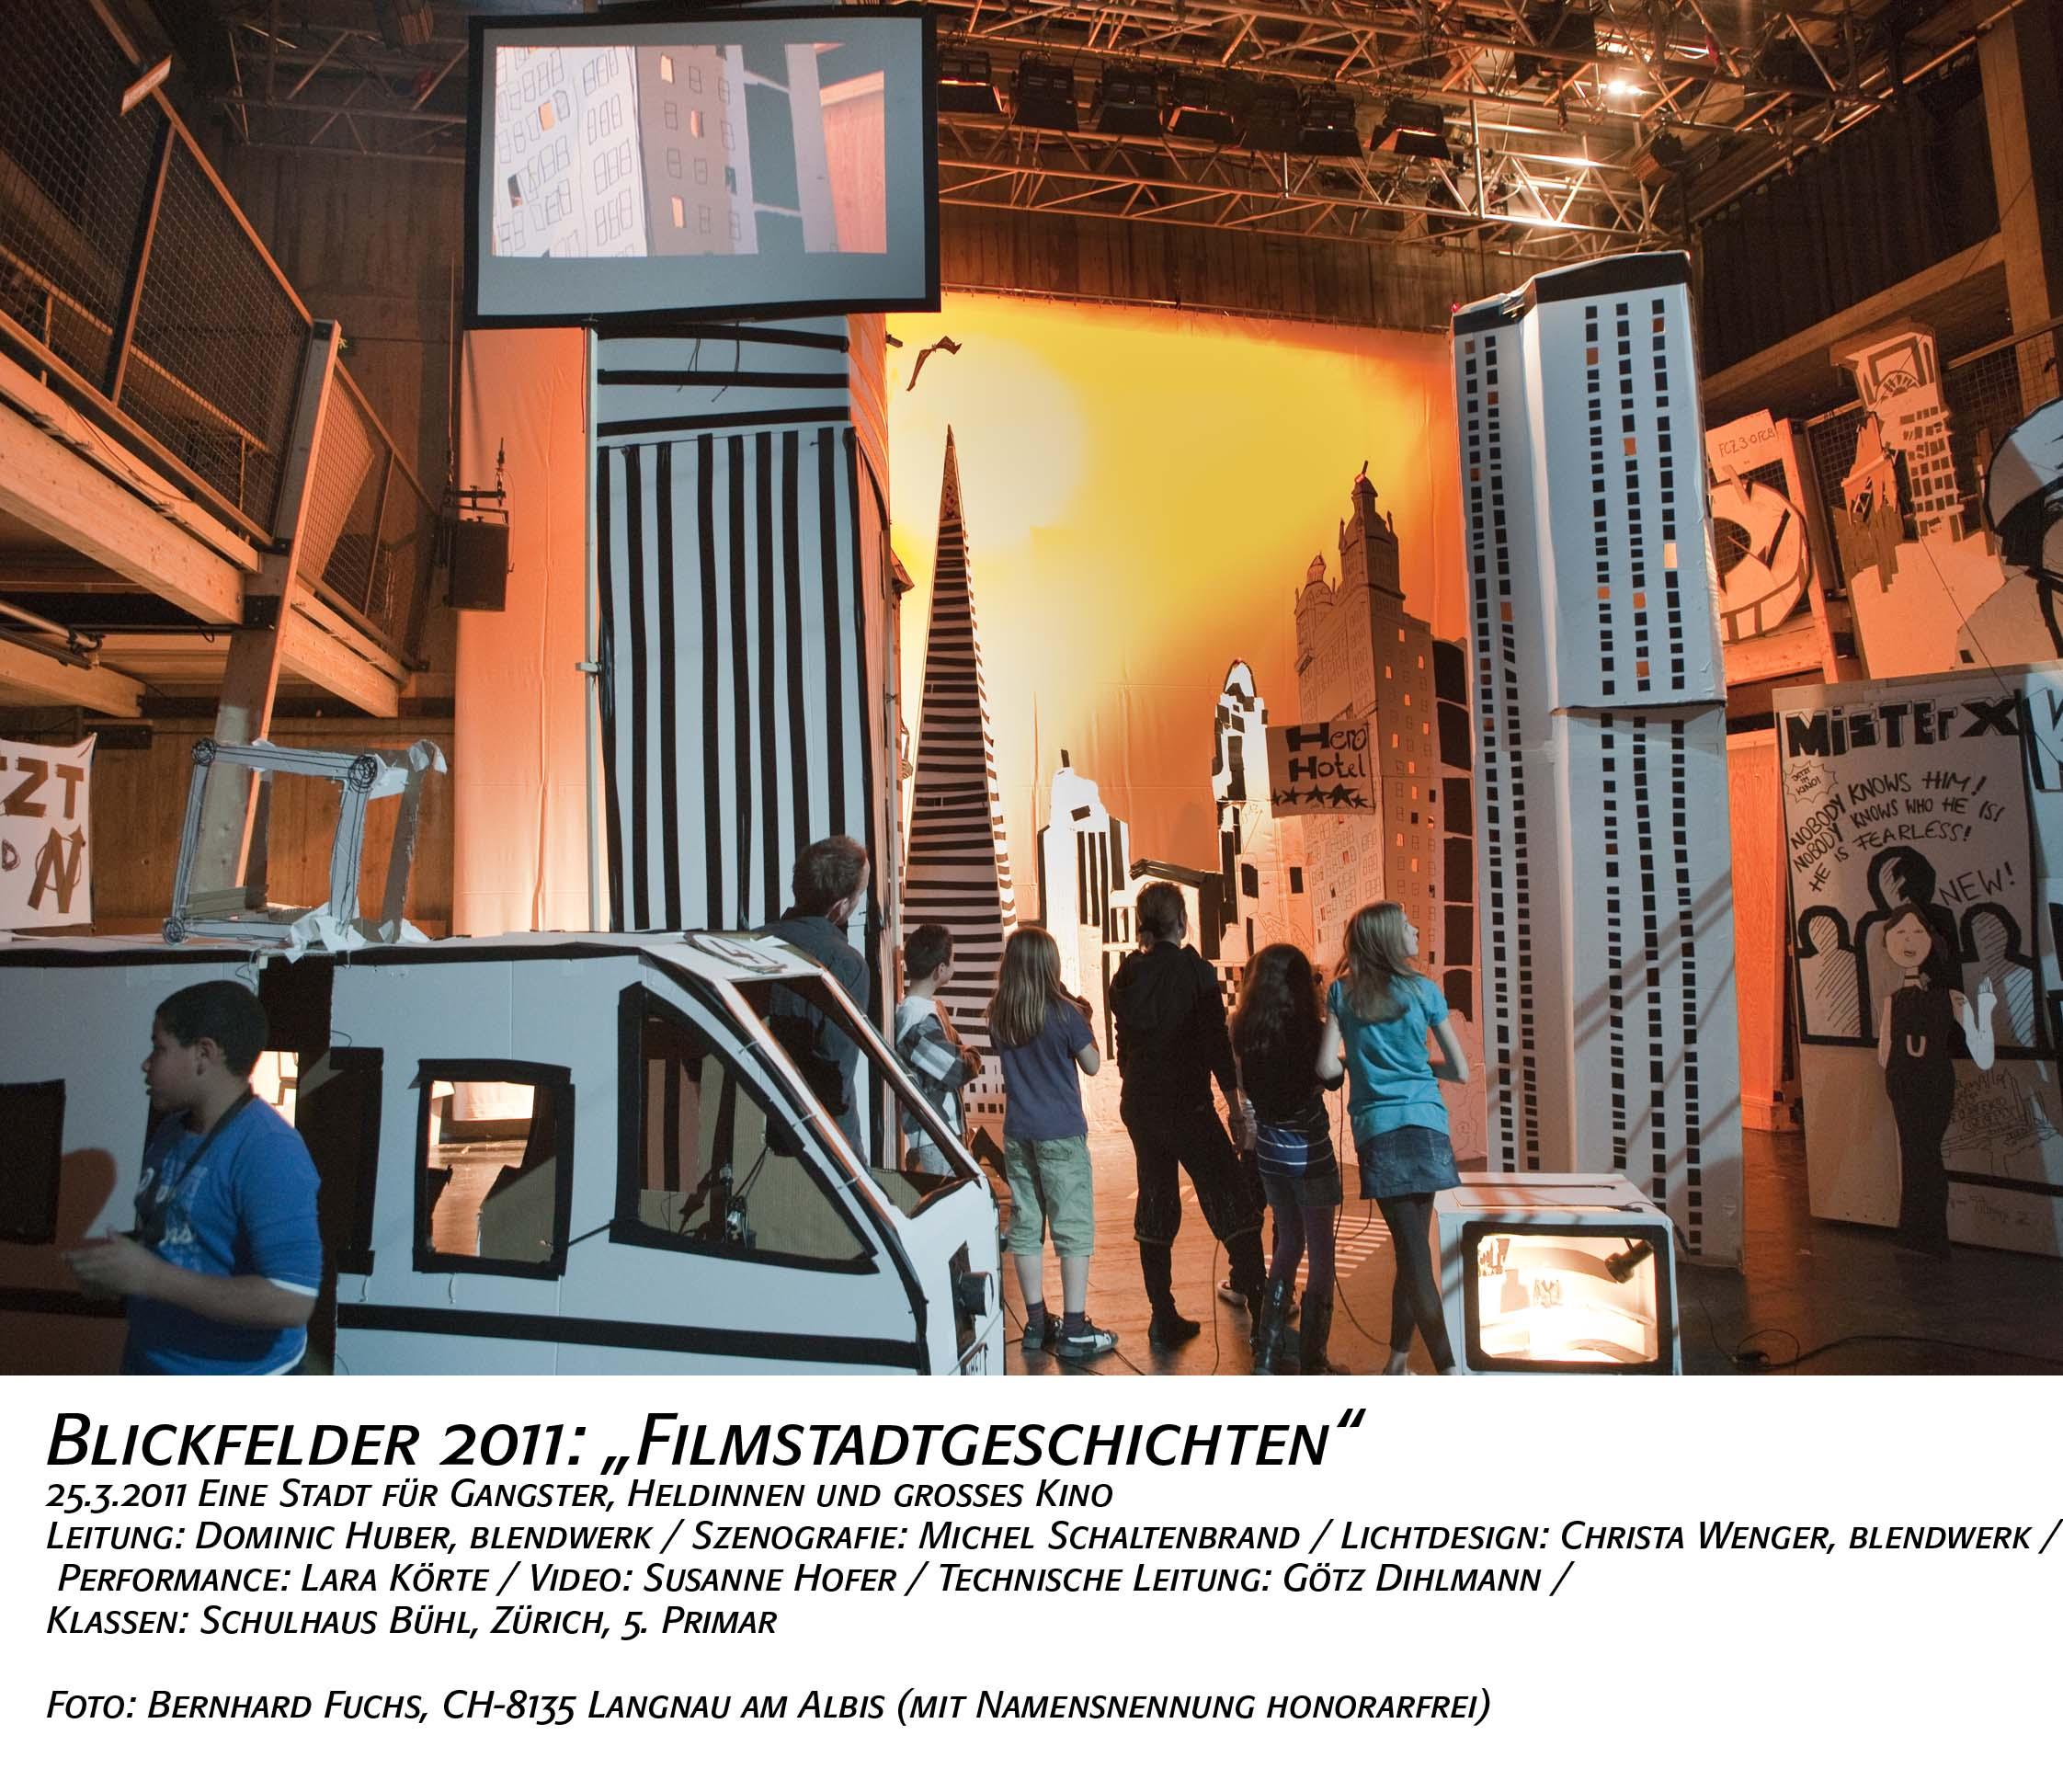 Filmstadtgeschichten-06.jpg